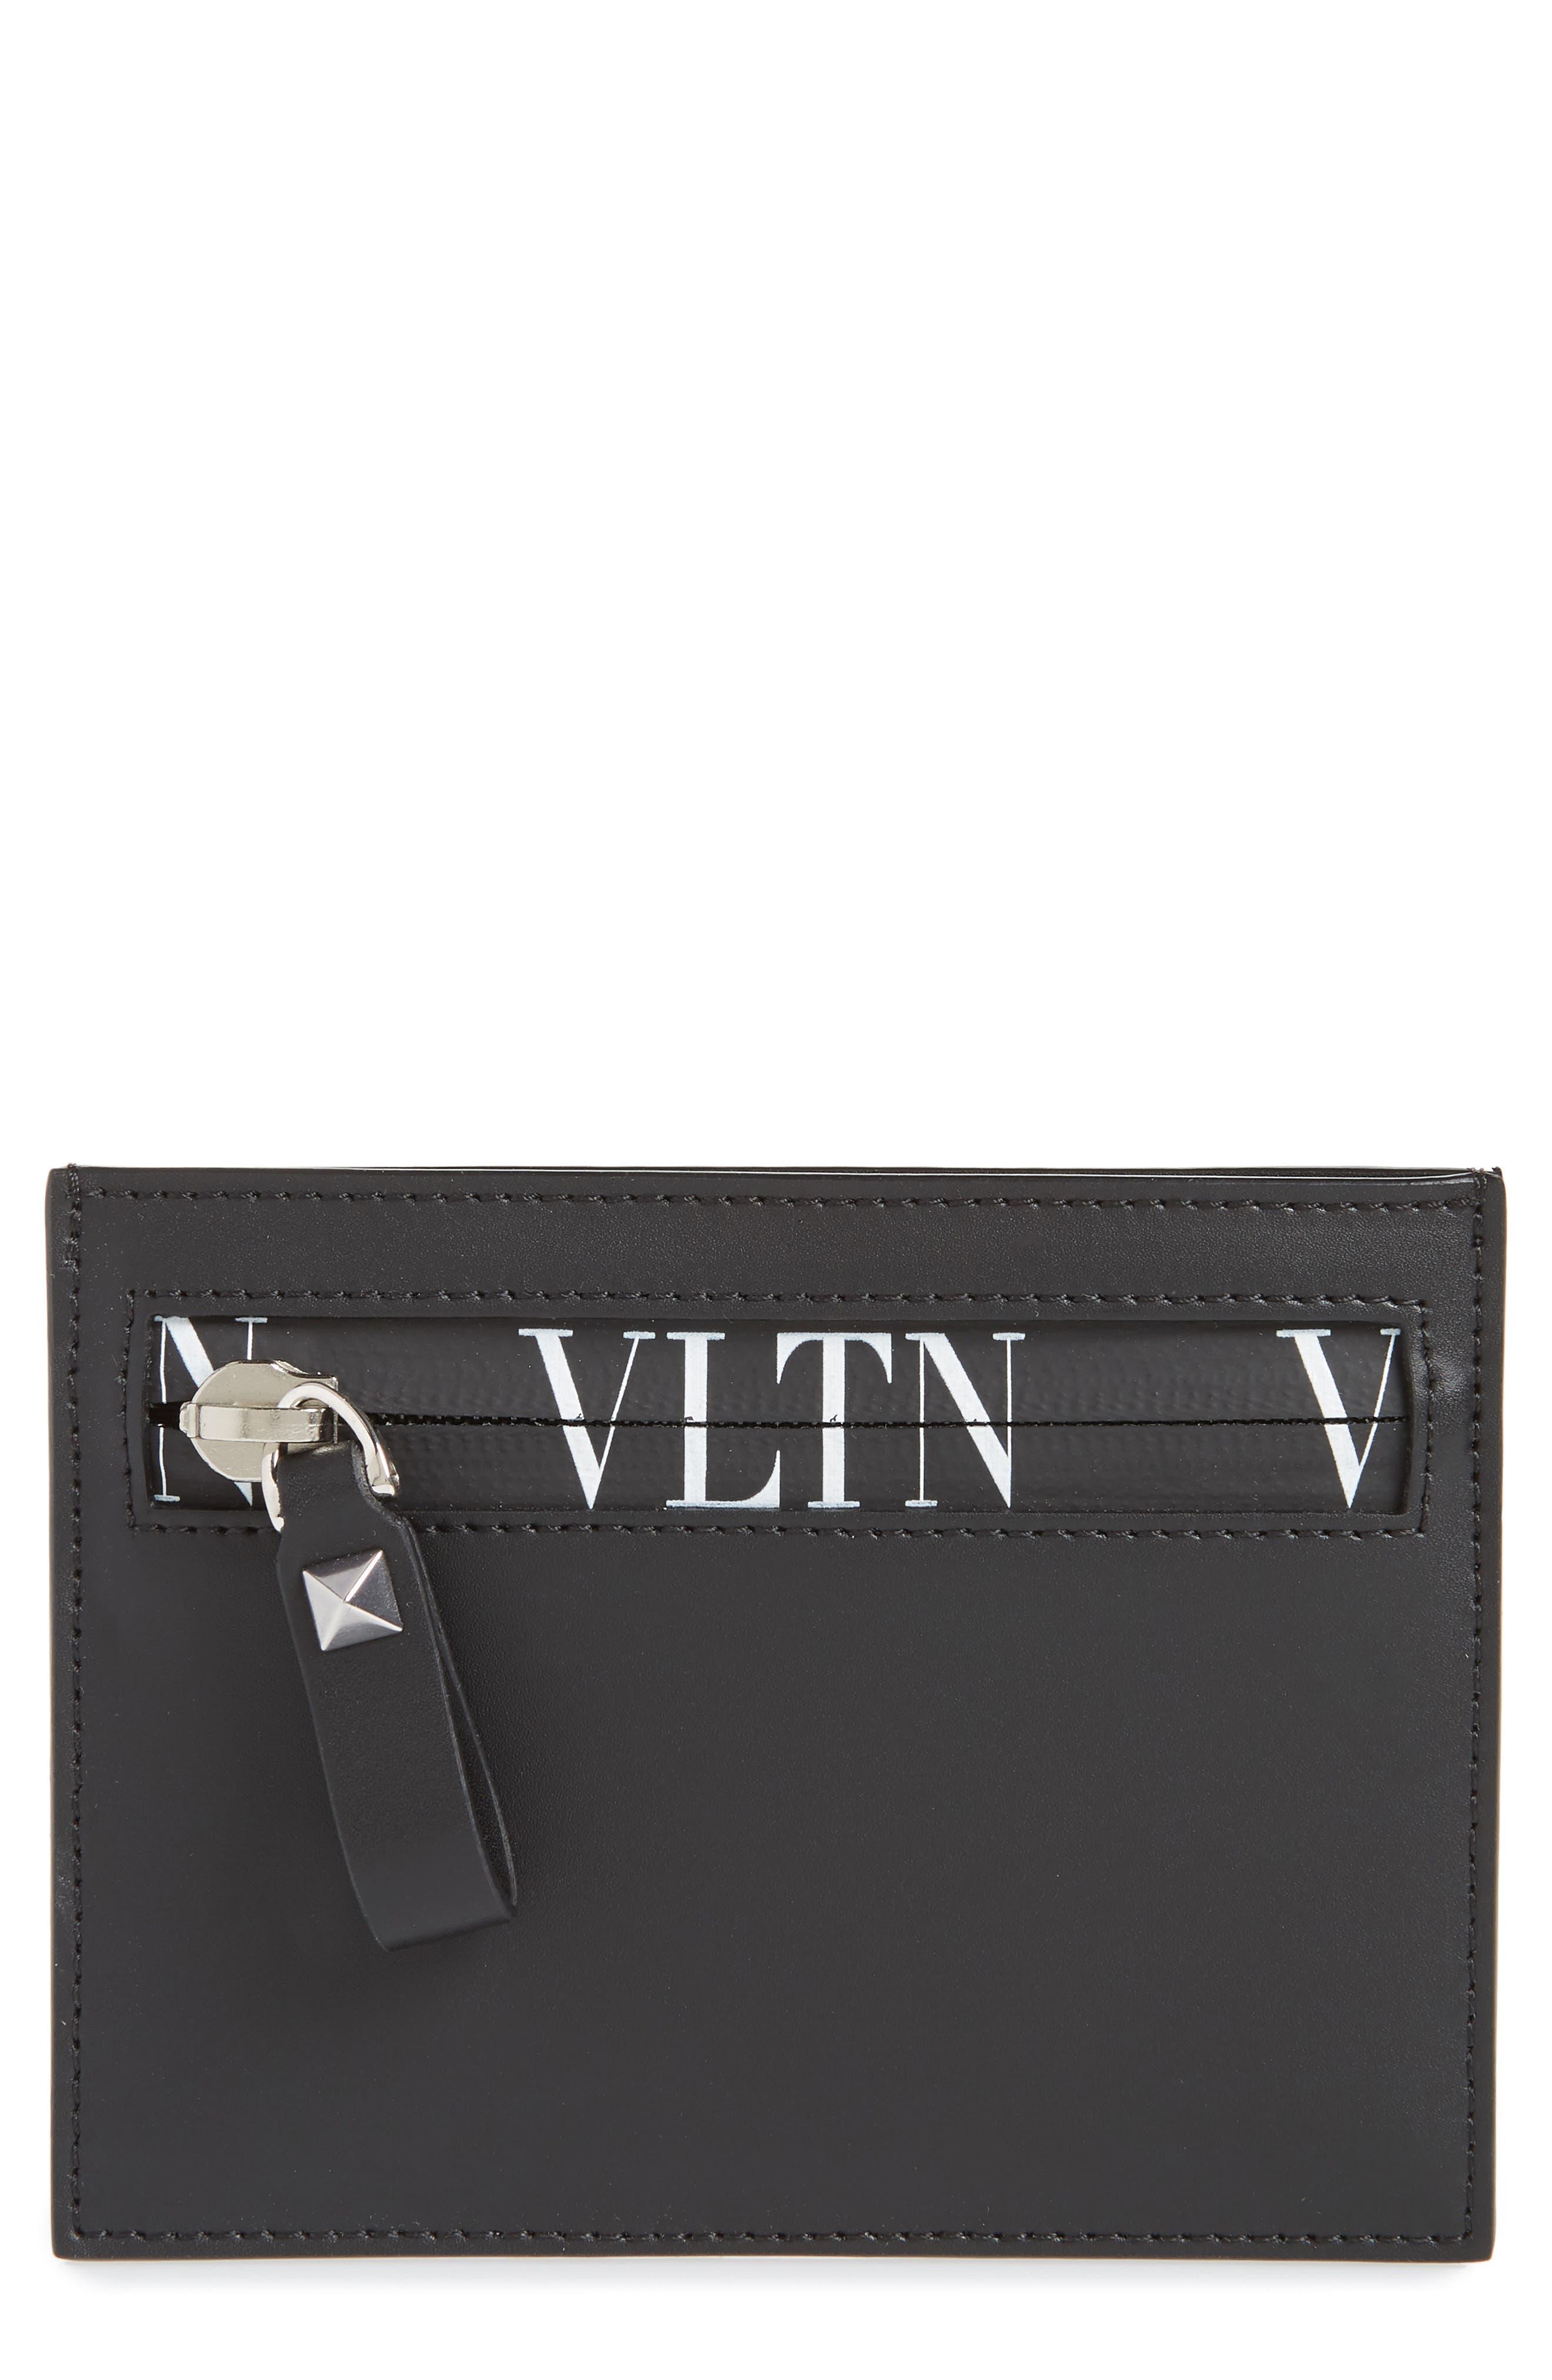 GARAVANI VLTN Logo Leather Card Case,                             Main thumbnail 1, color,                             BLACK/ WHITE